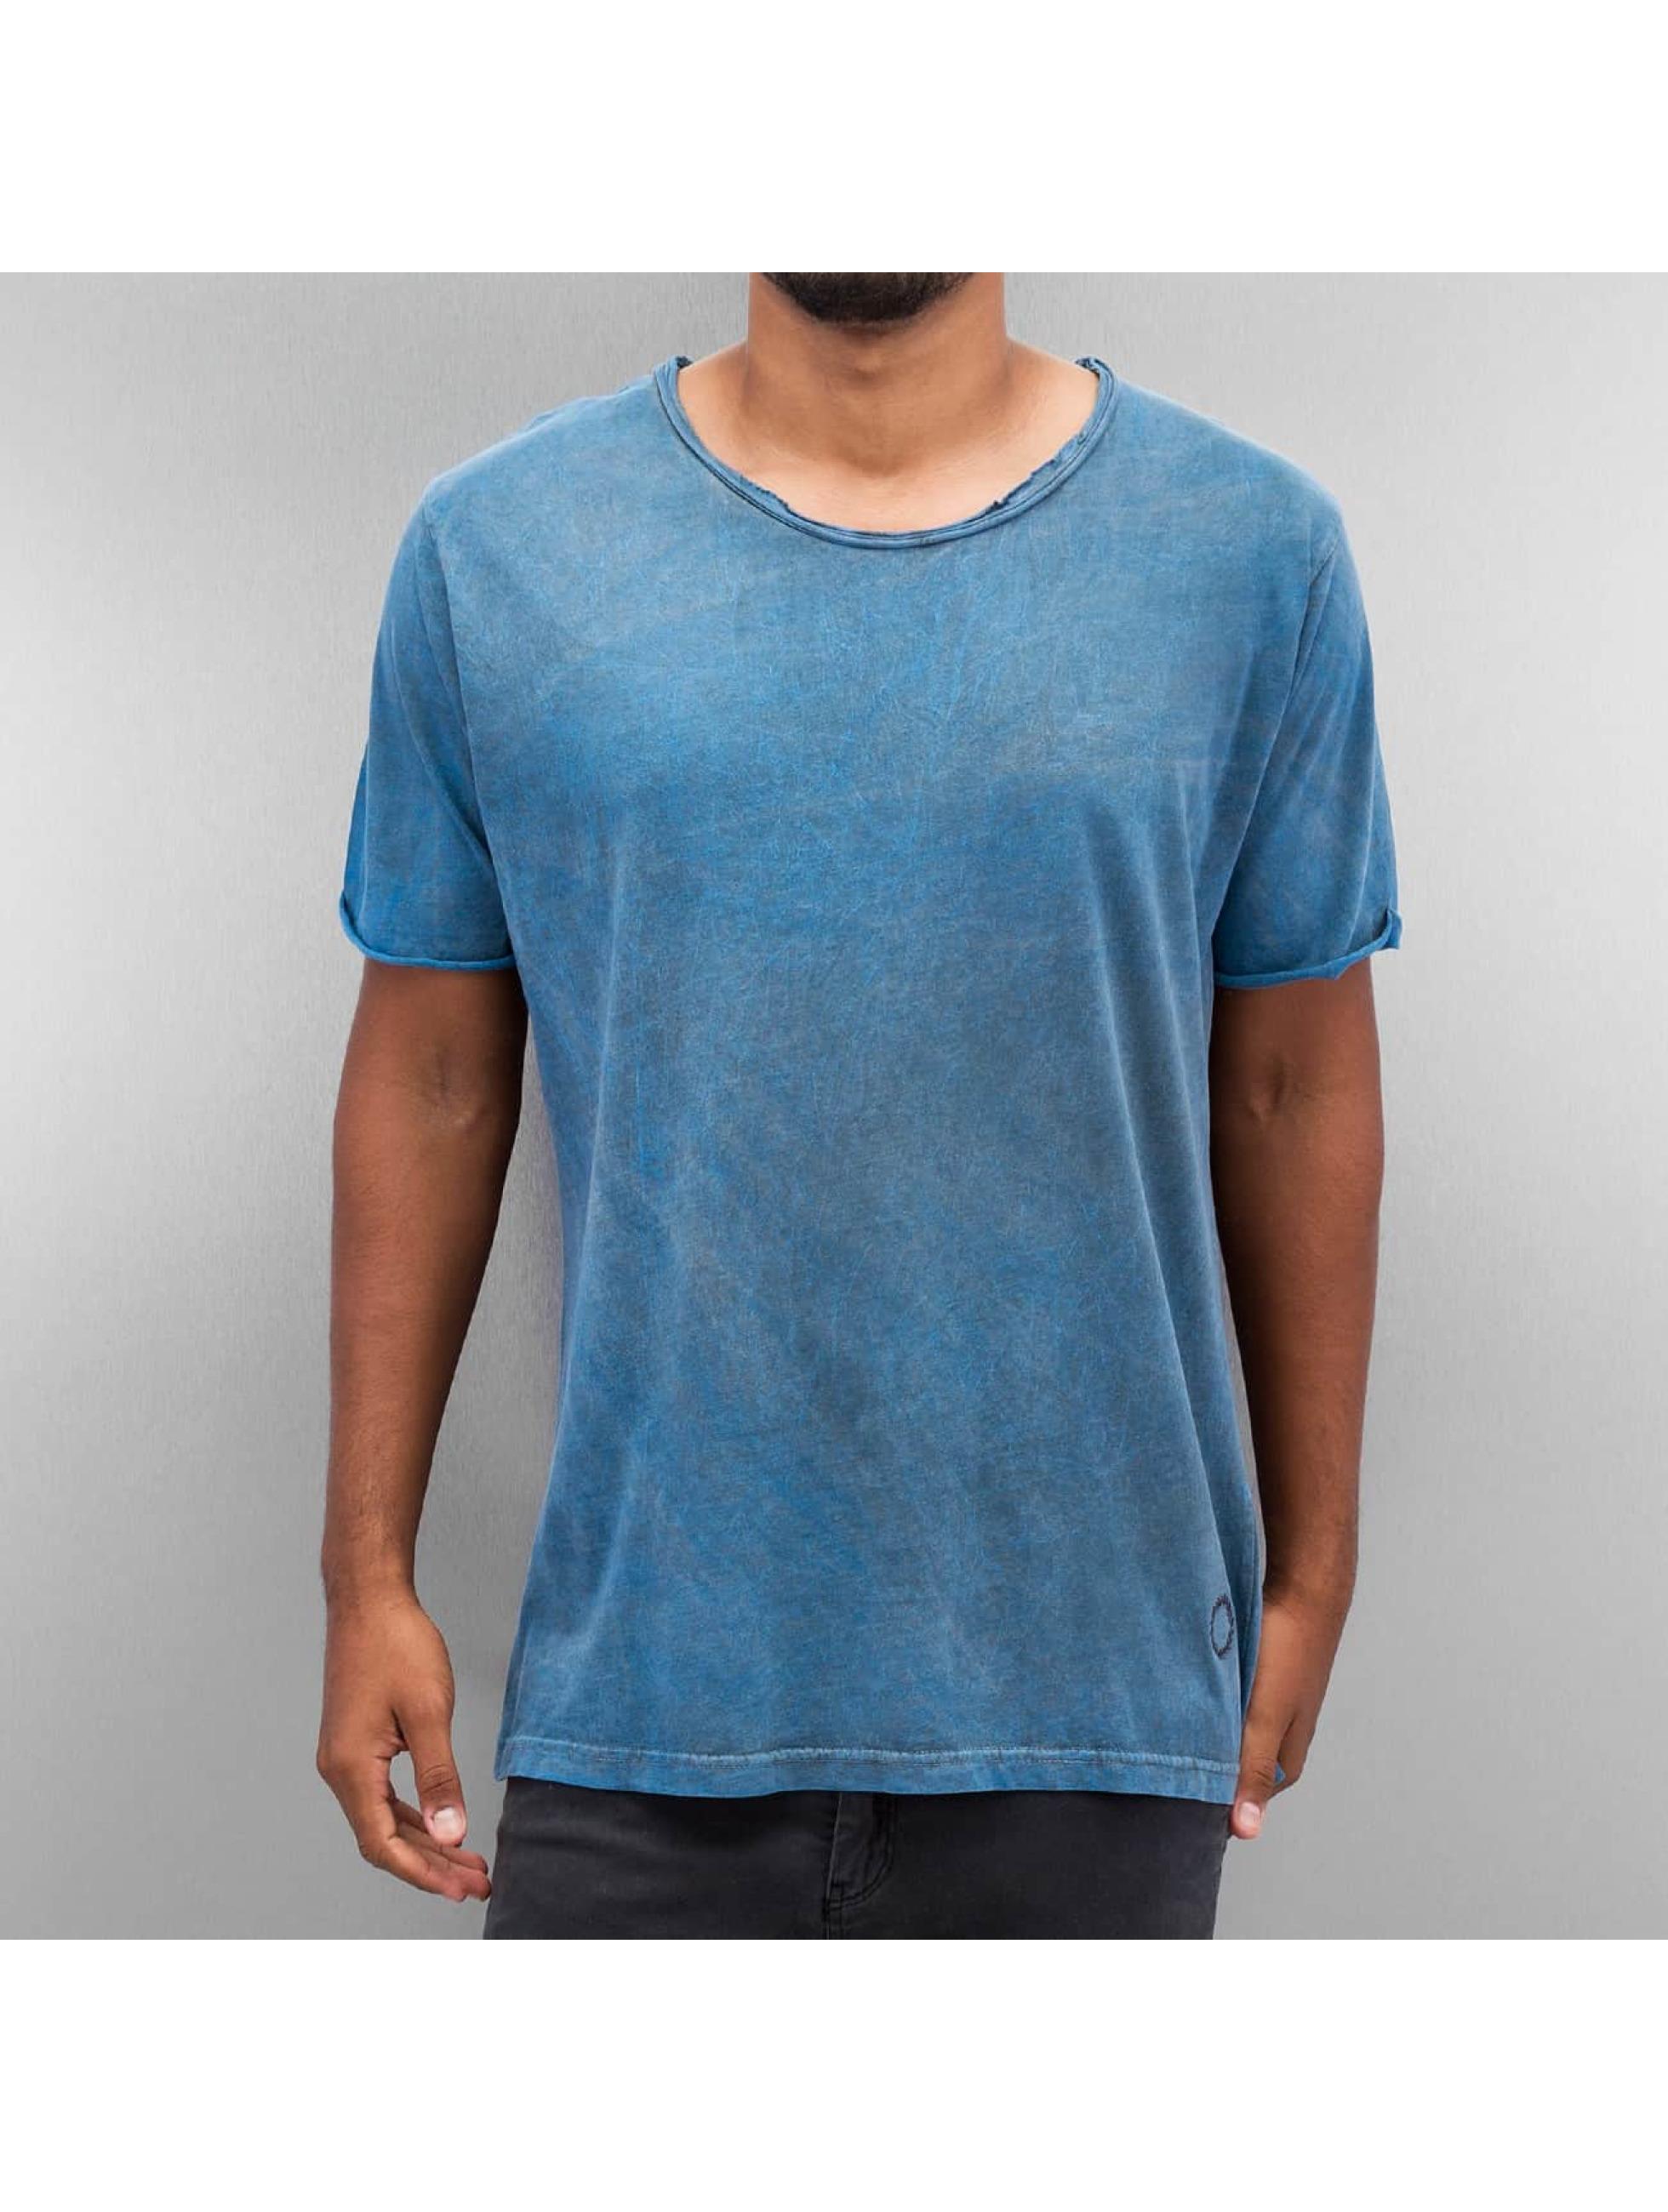 Yezz Männer T-Shirt Marble in blau